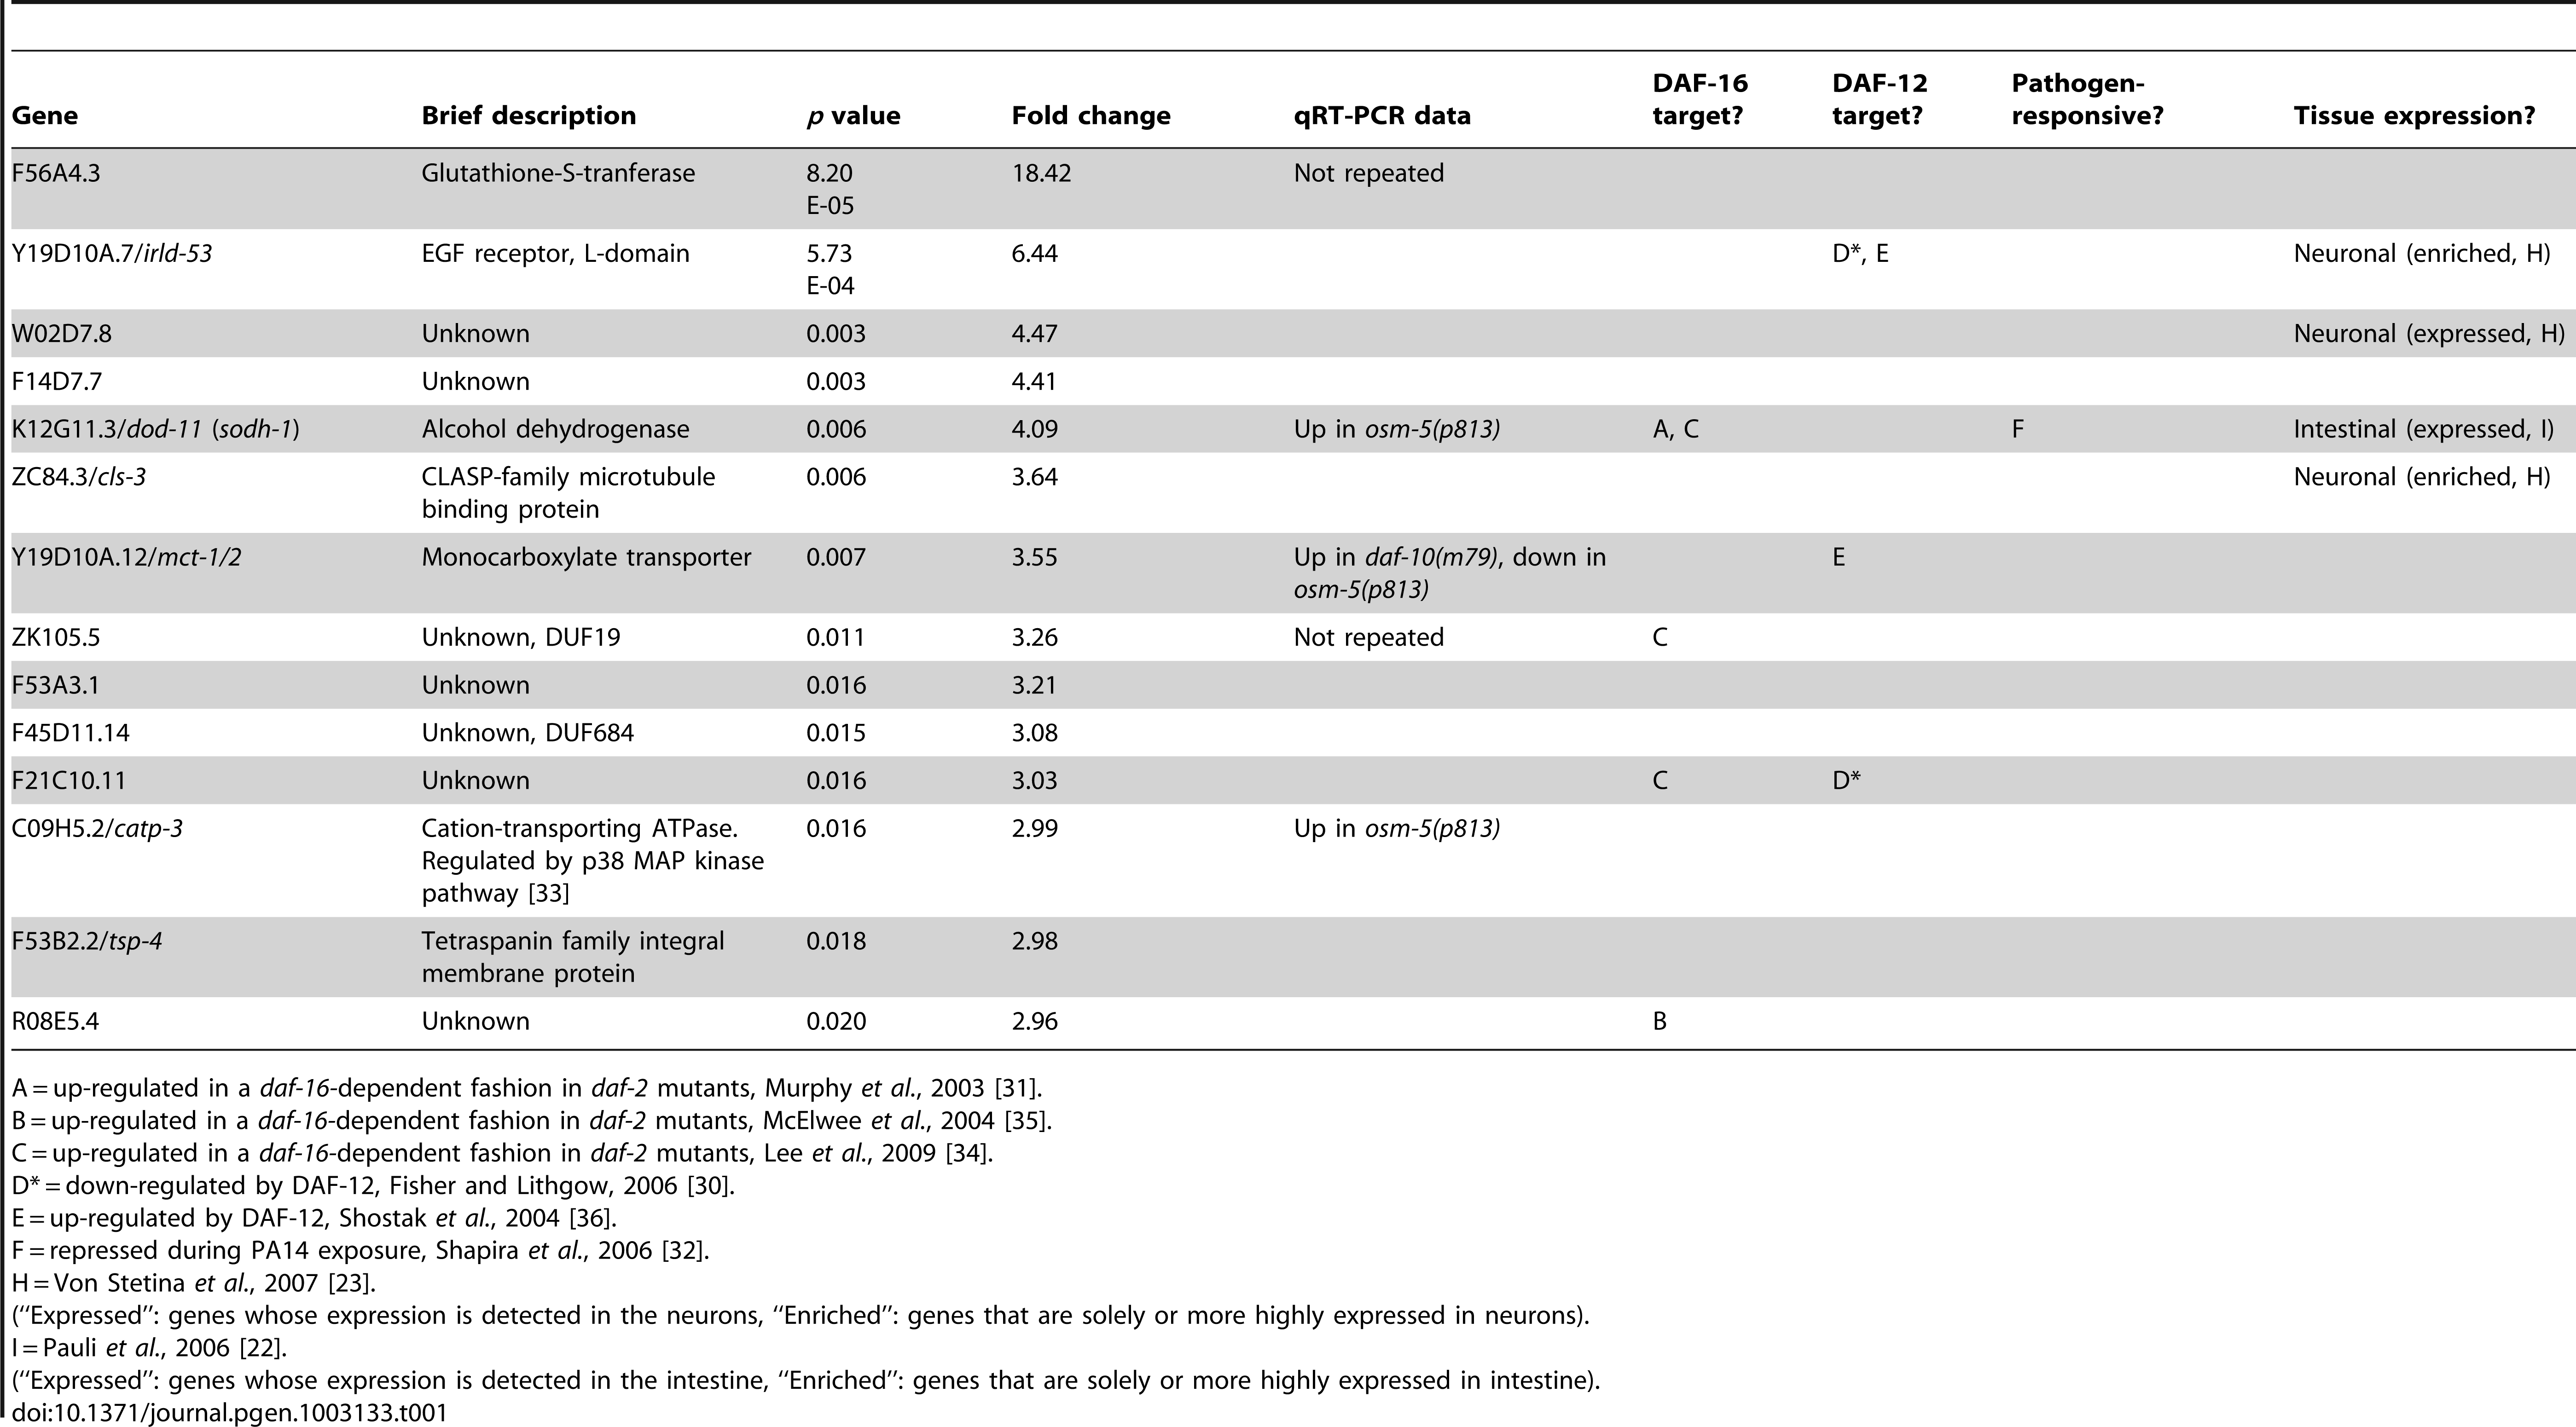 Genes up-regulated in <i>daf-10(m79)</i> mutants versus wild-type animals.